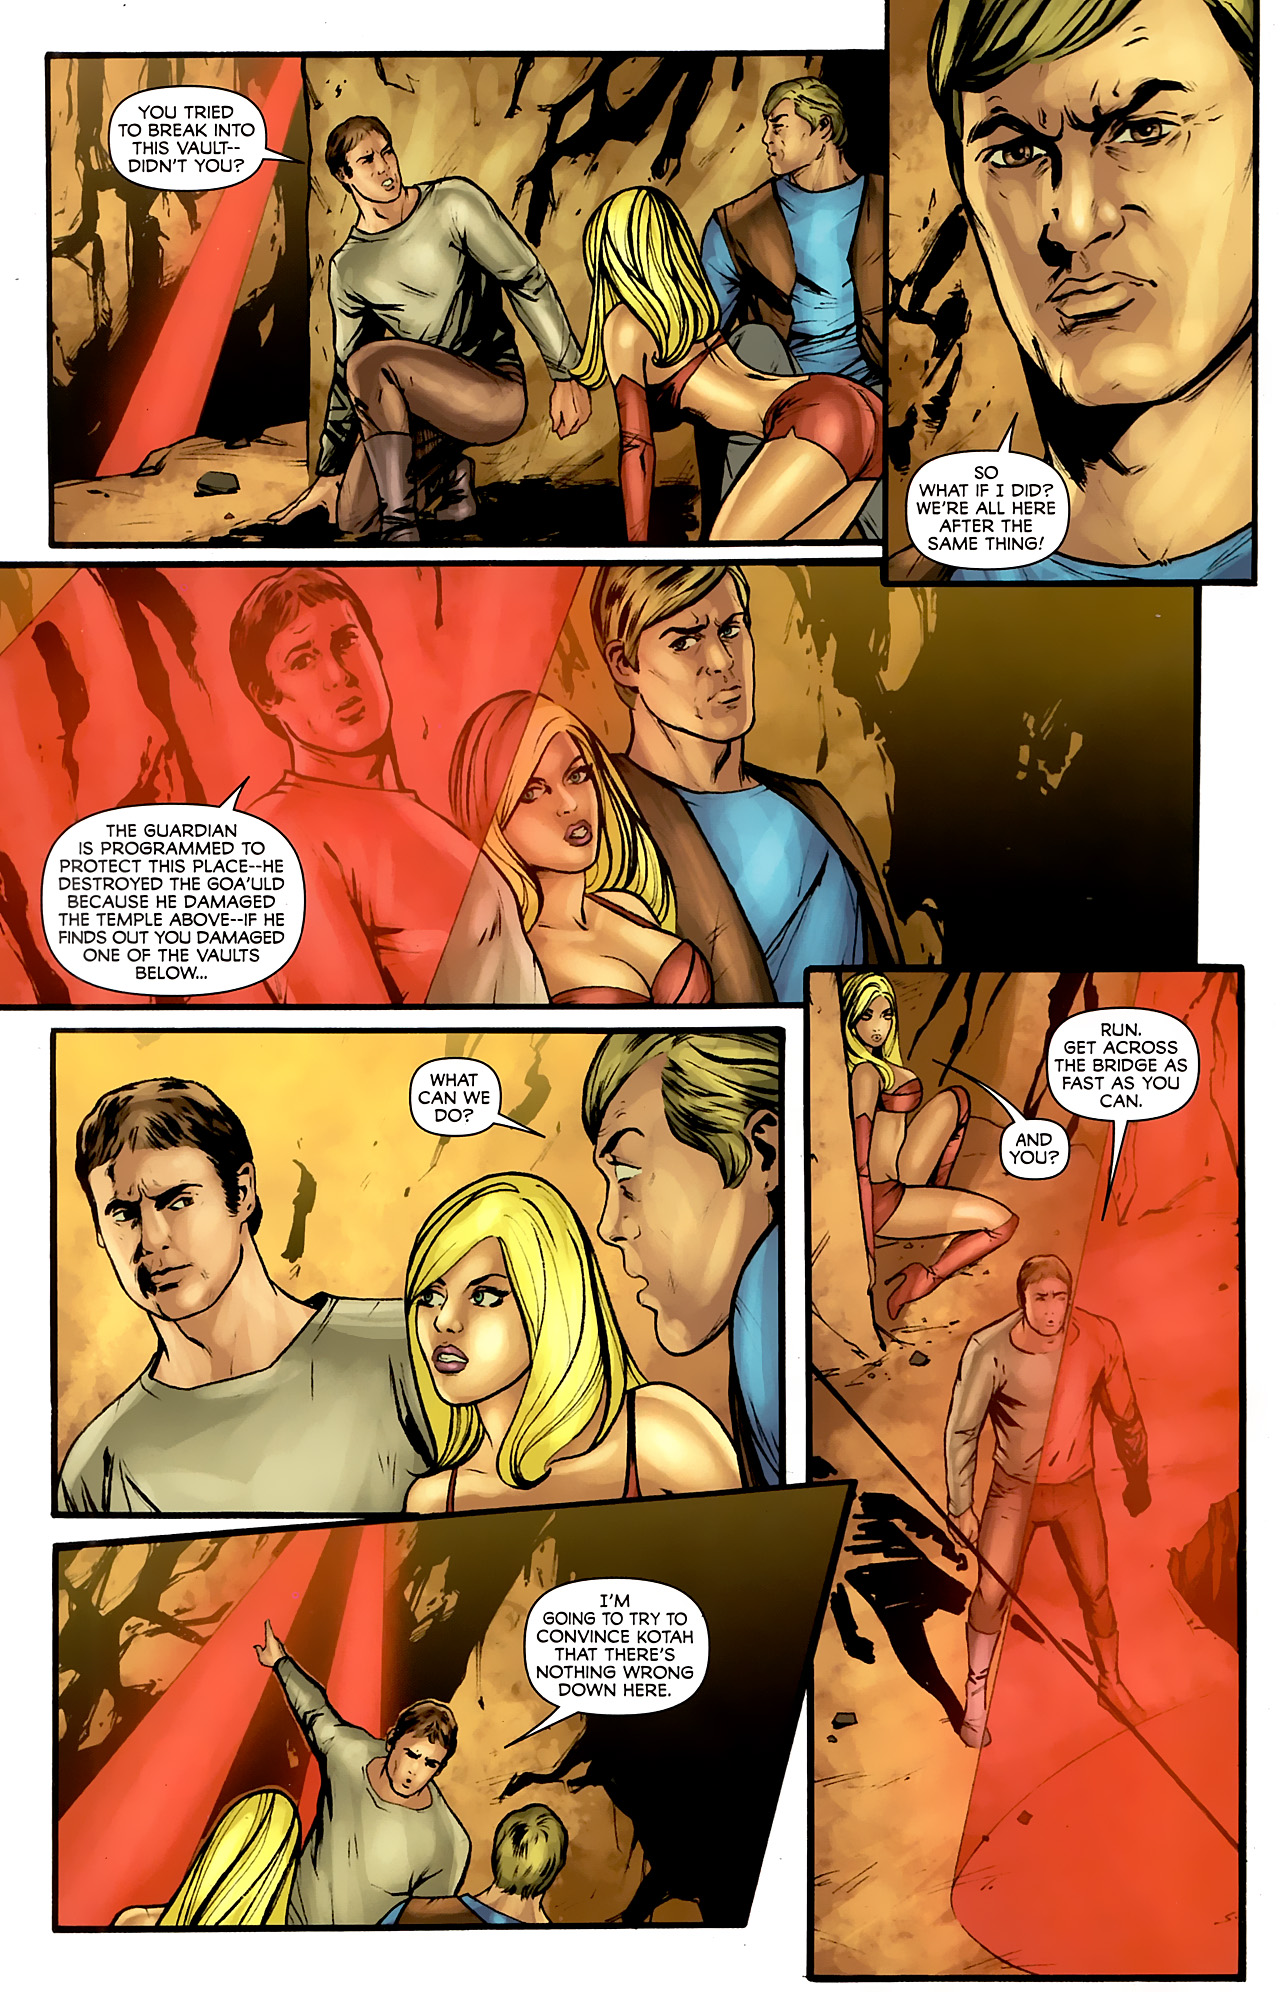 Read online Stargate: Daniel Jackson comic -  Issue #4 - 6